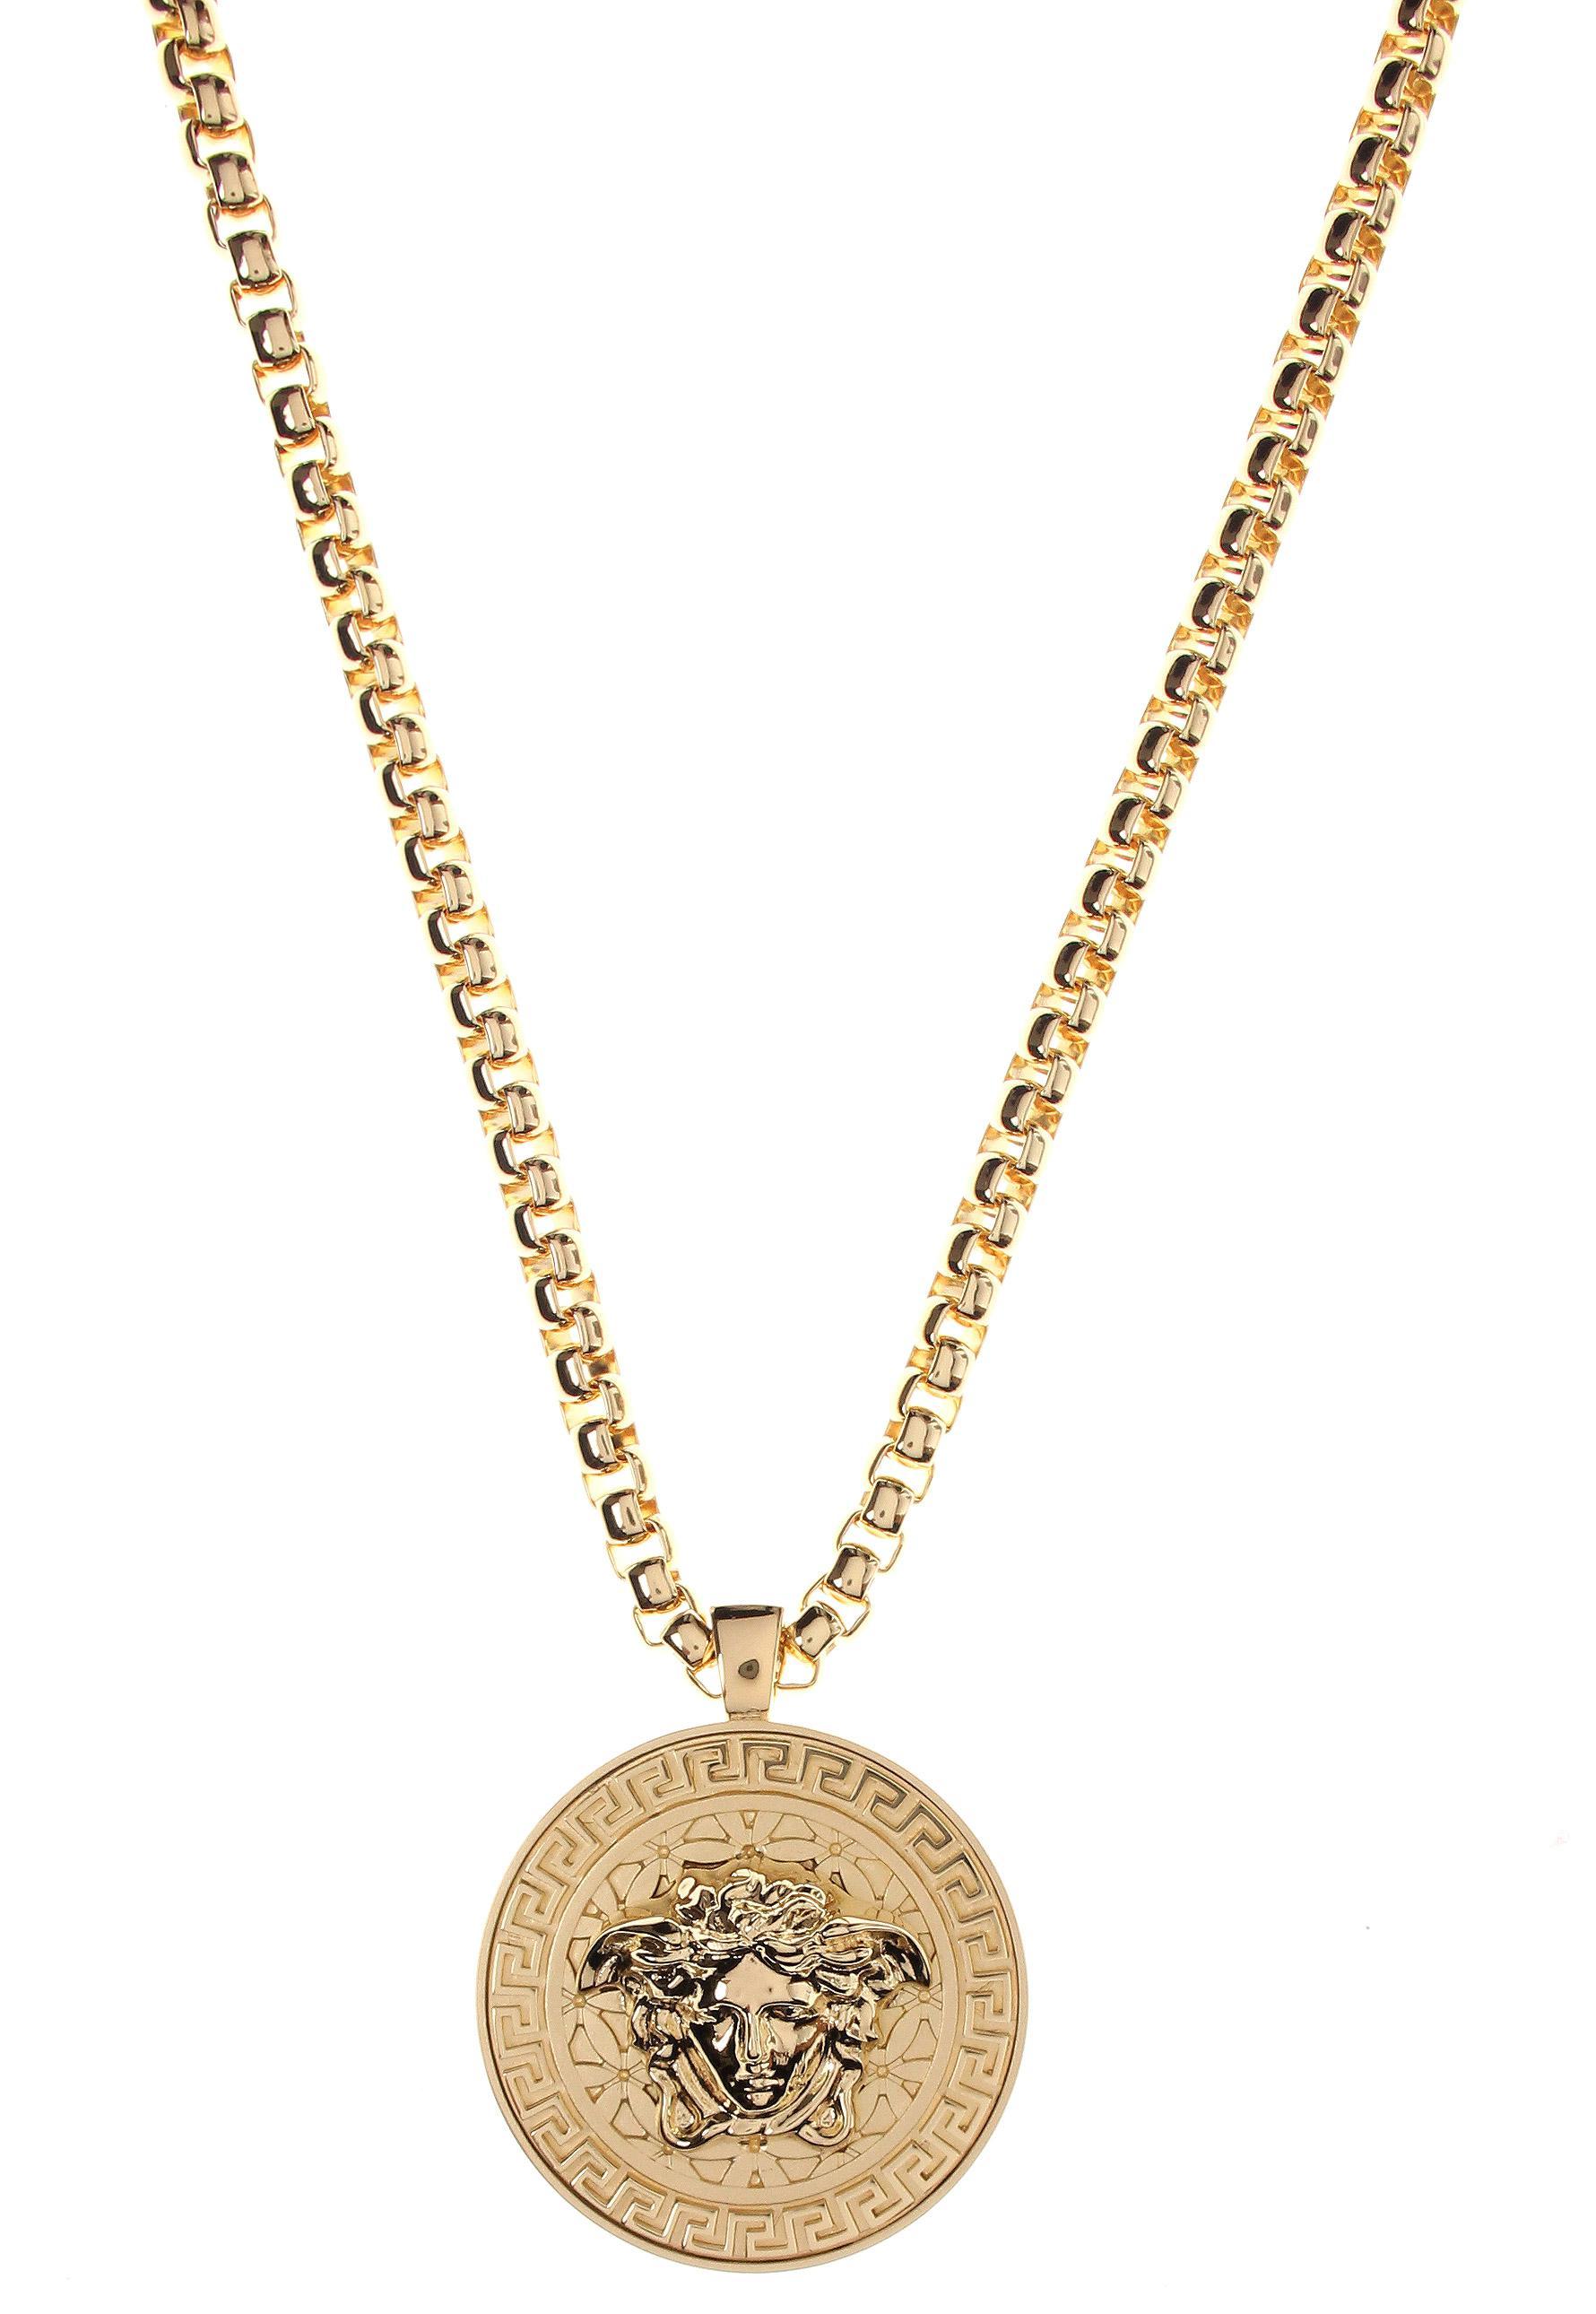 Versace Medusa Head Medallion Gold Necklace in Metallic